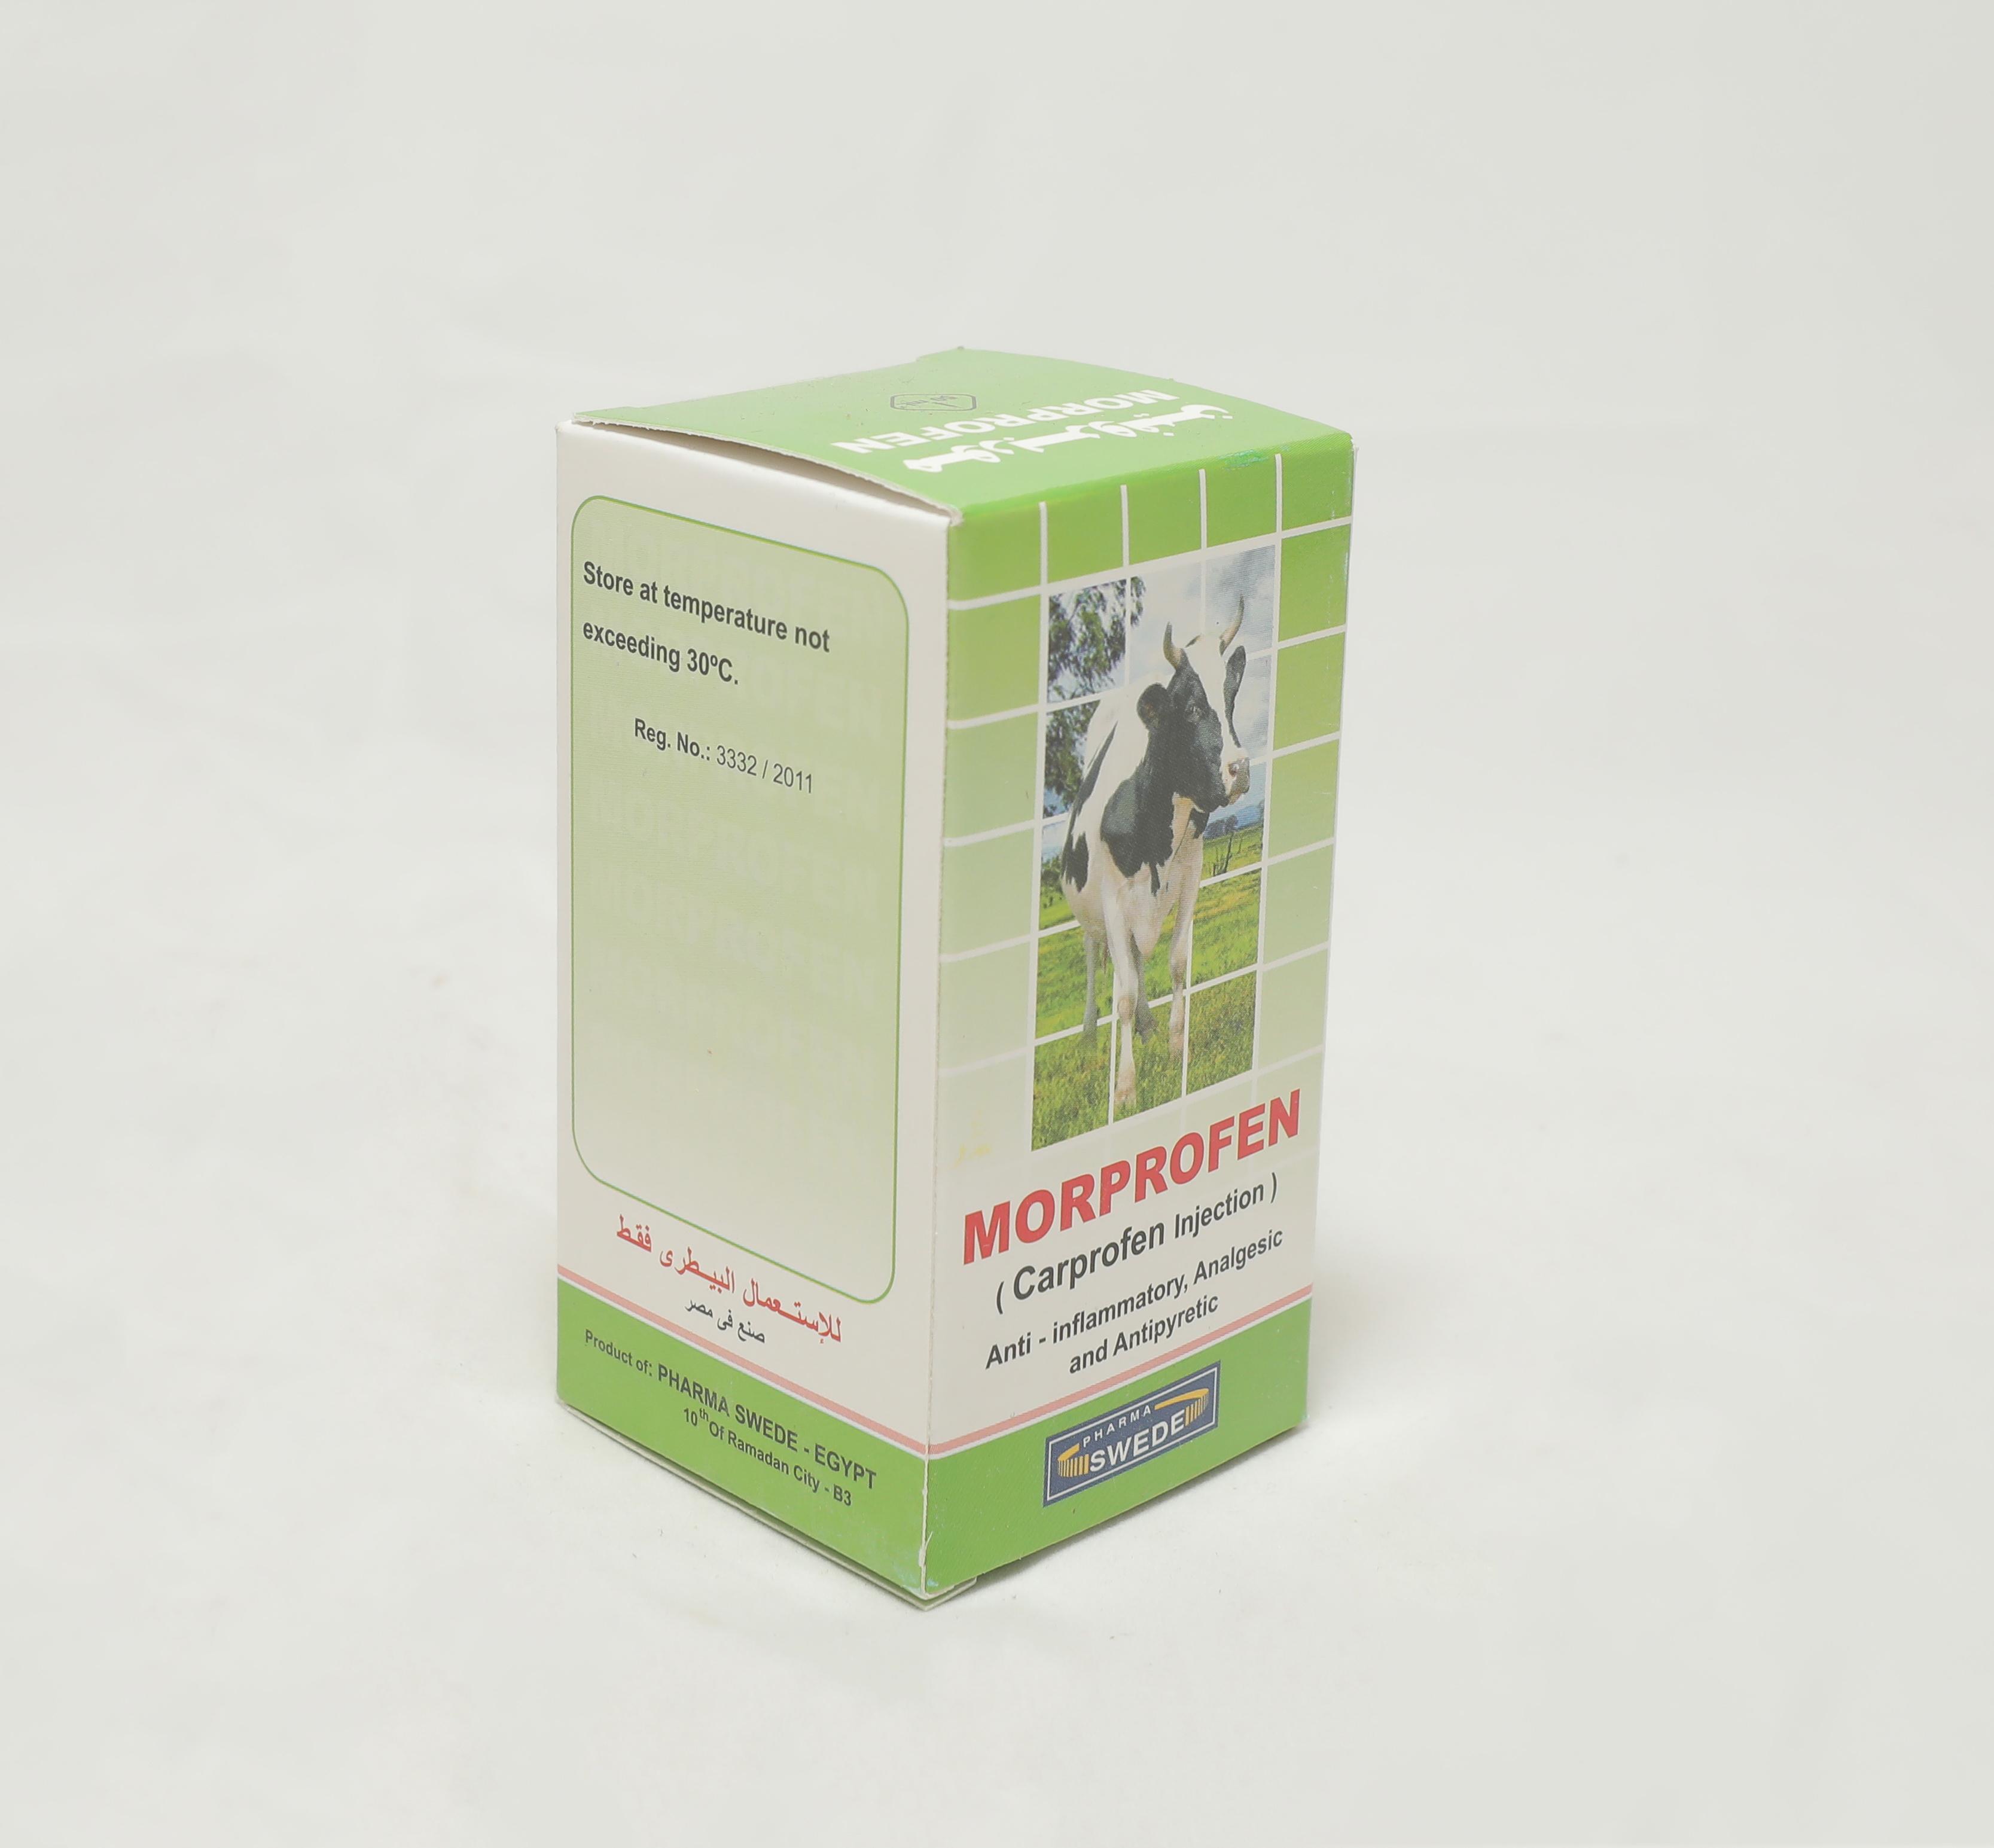 Morprofen Injection